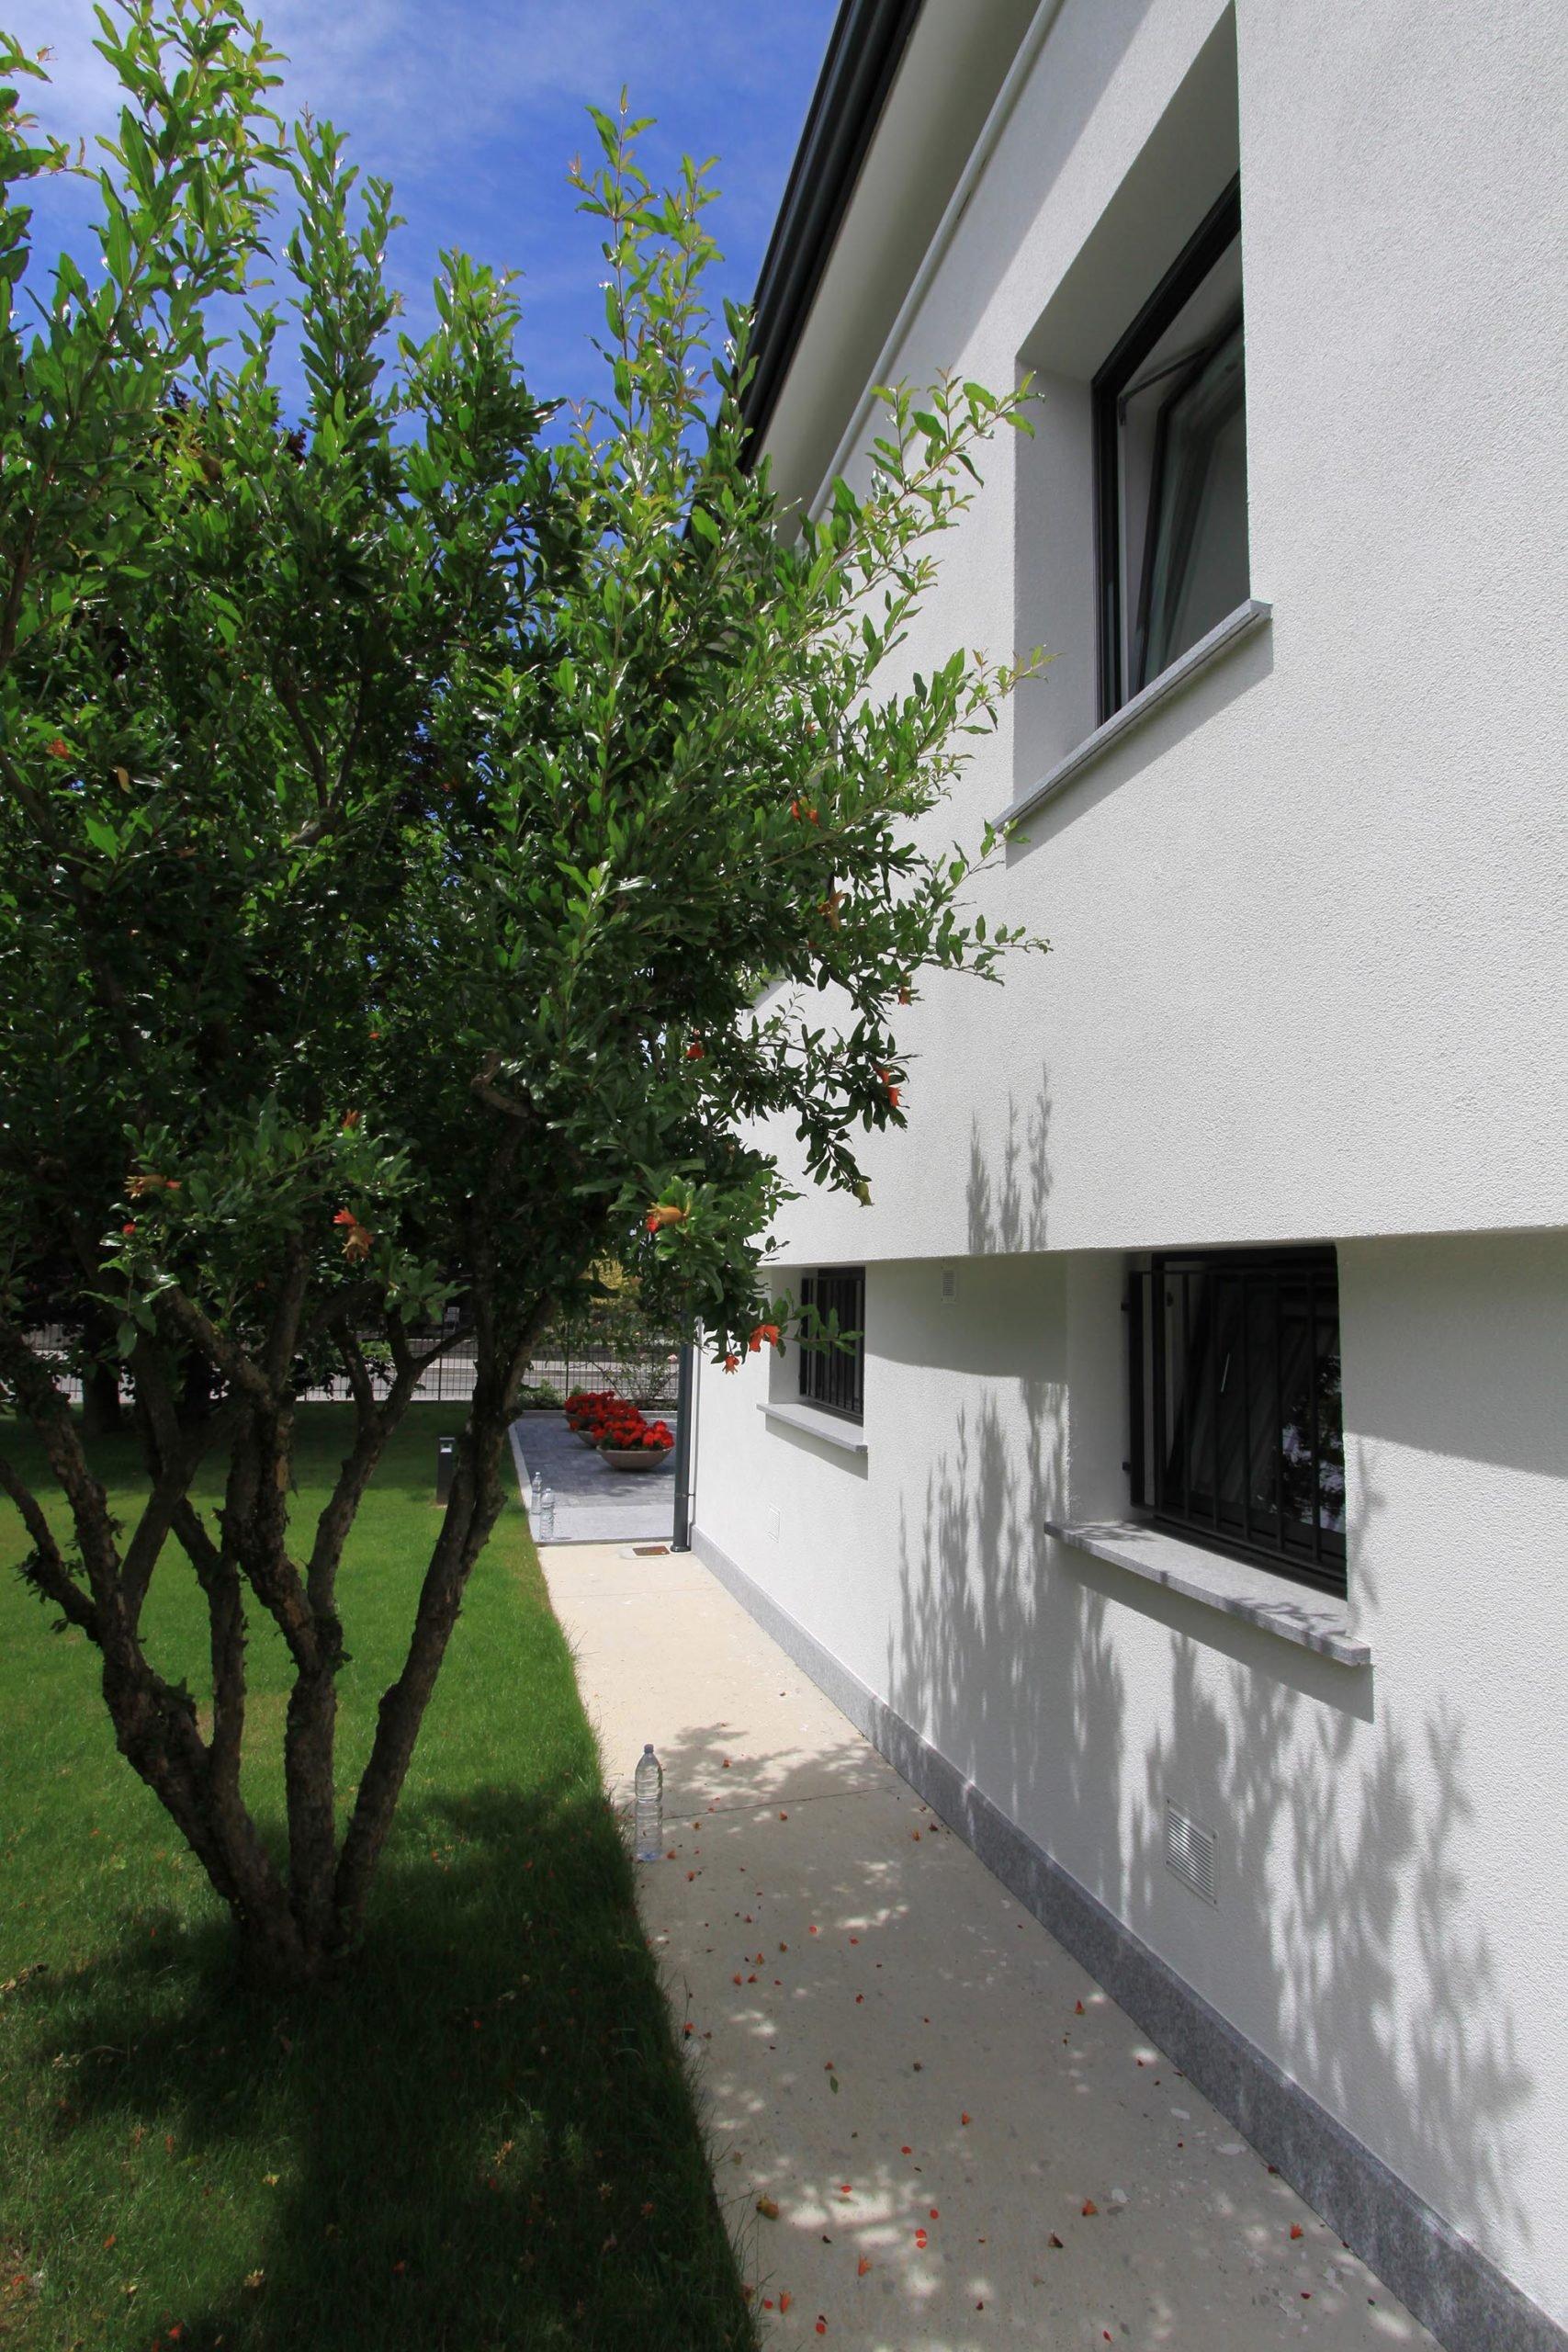 umberto_mauri_architetto_mauri_studio_lago_pusiano_como_bosisio_parini_private_renovation_house_residential_2000_03